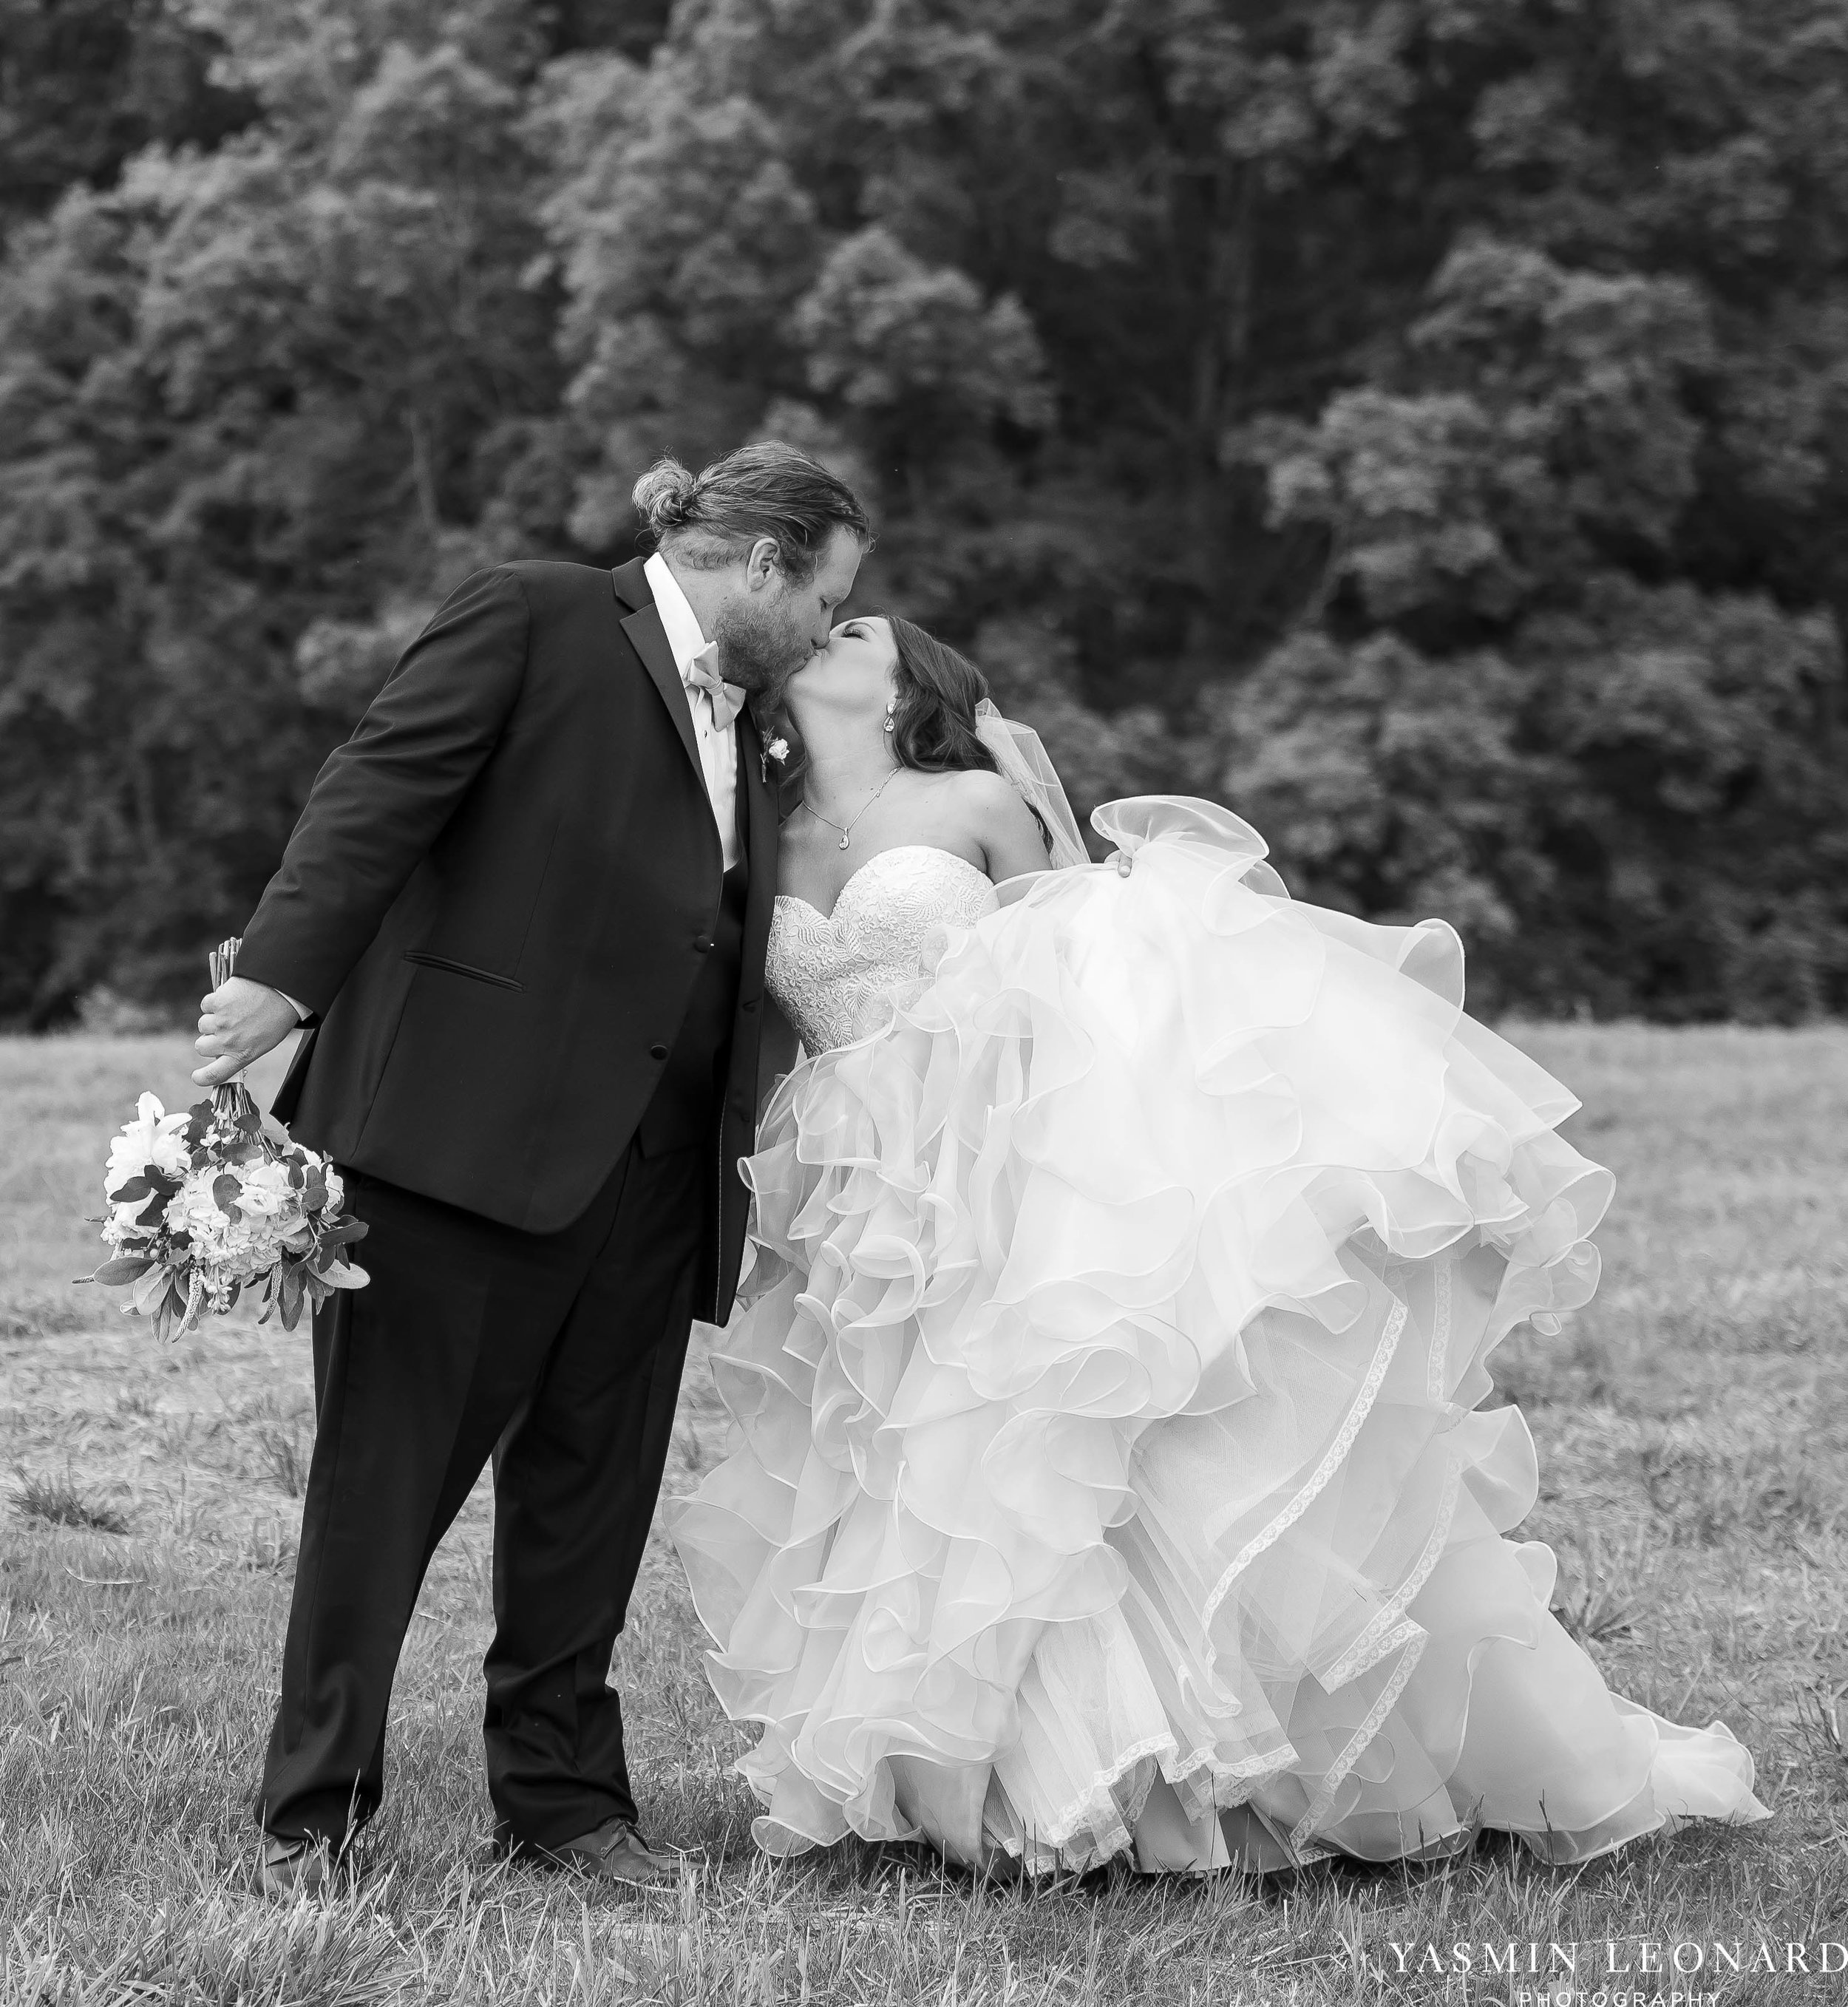 Rain on your wedding day - Rainy Wedding - Plan B for Rain - What to do if it rains on your wedding day - Wedding Inspiration - Outdoor wedding ideas - Rainy Wedding Pictures - Yasmin Leonard Photography-41.jpg